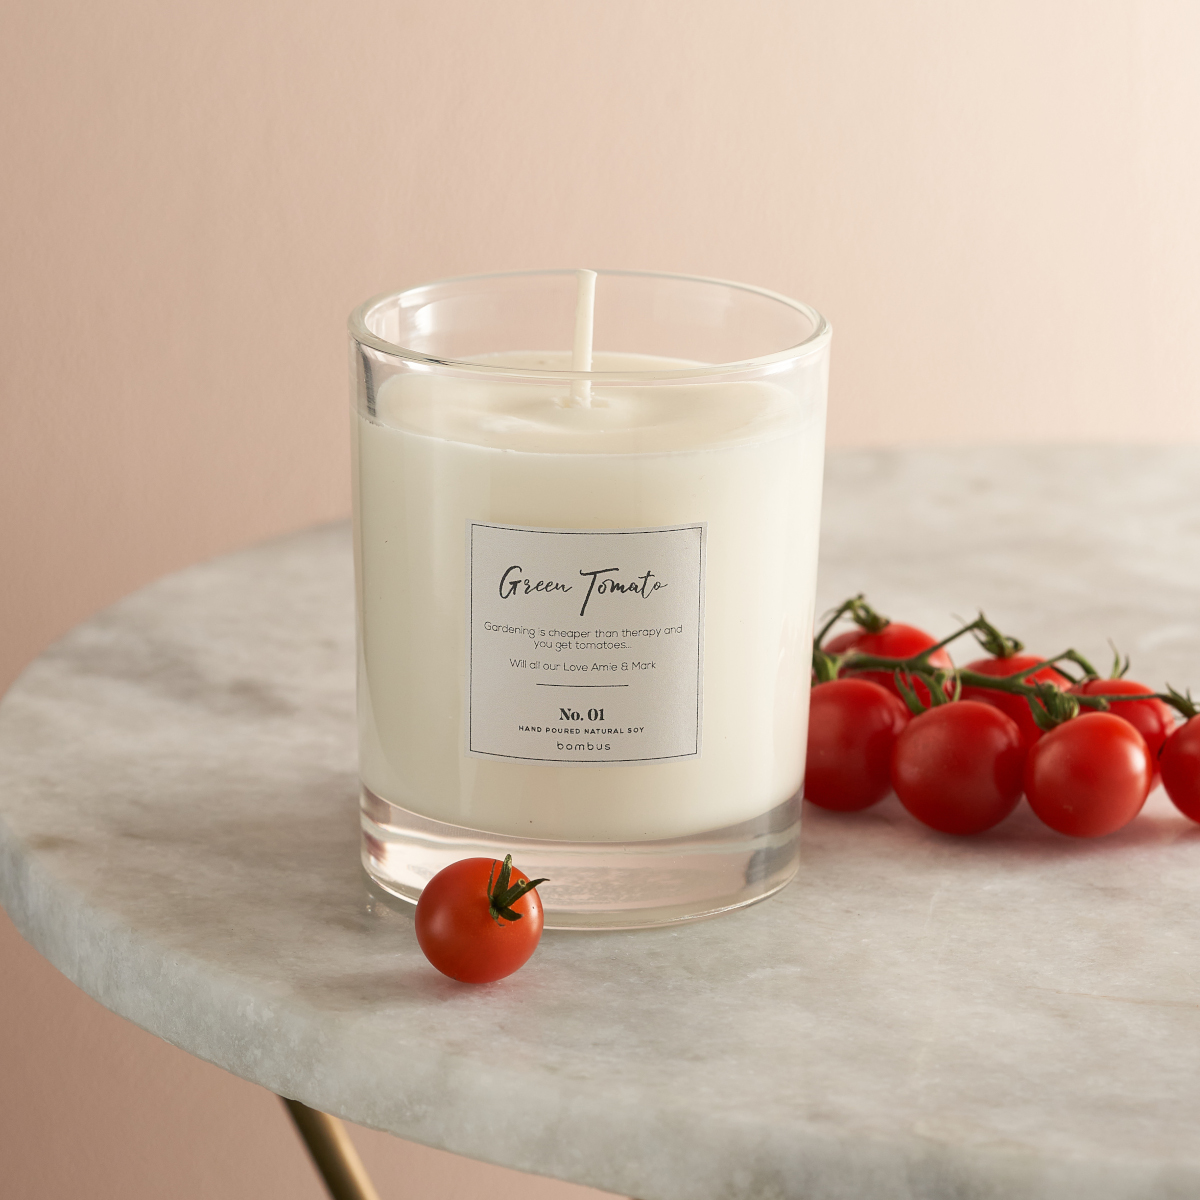 Freen tomato candle